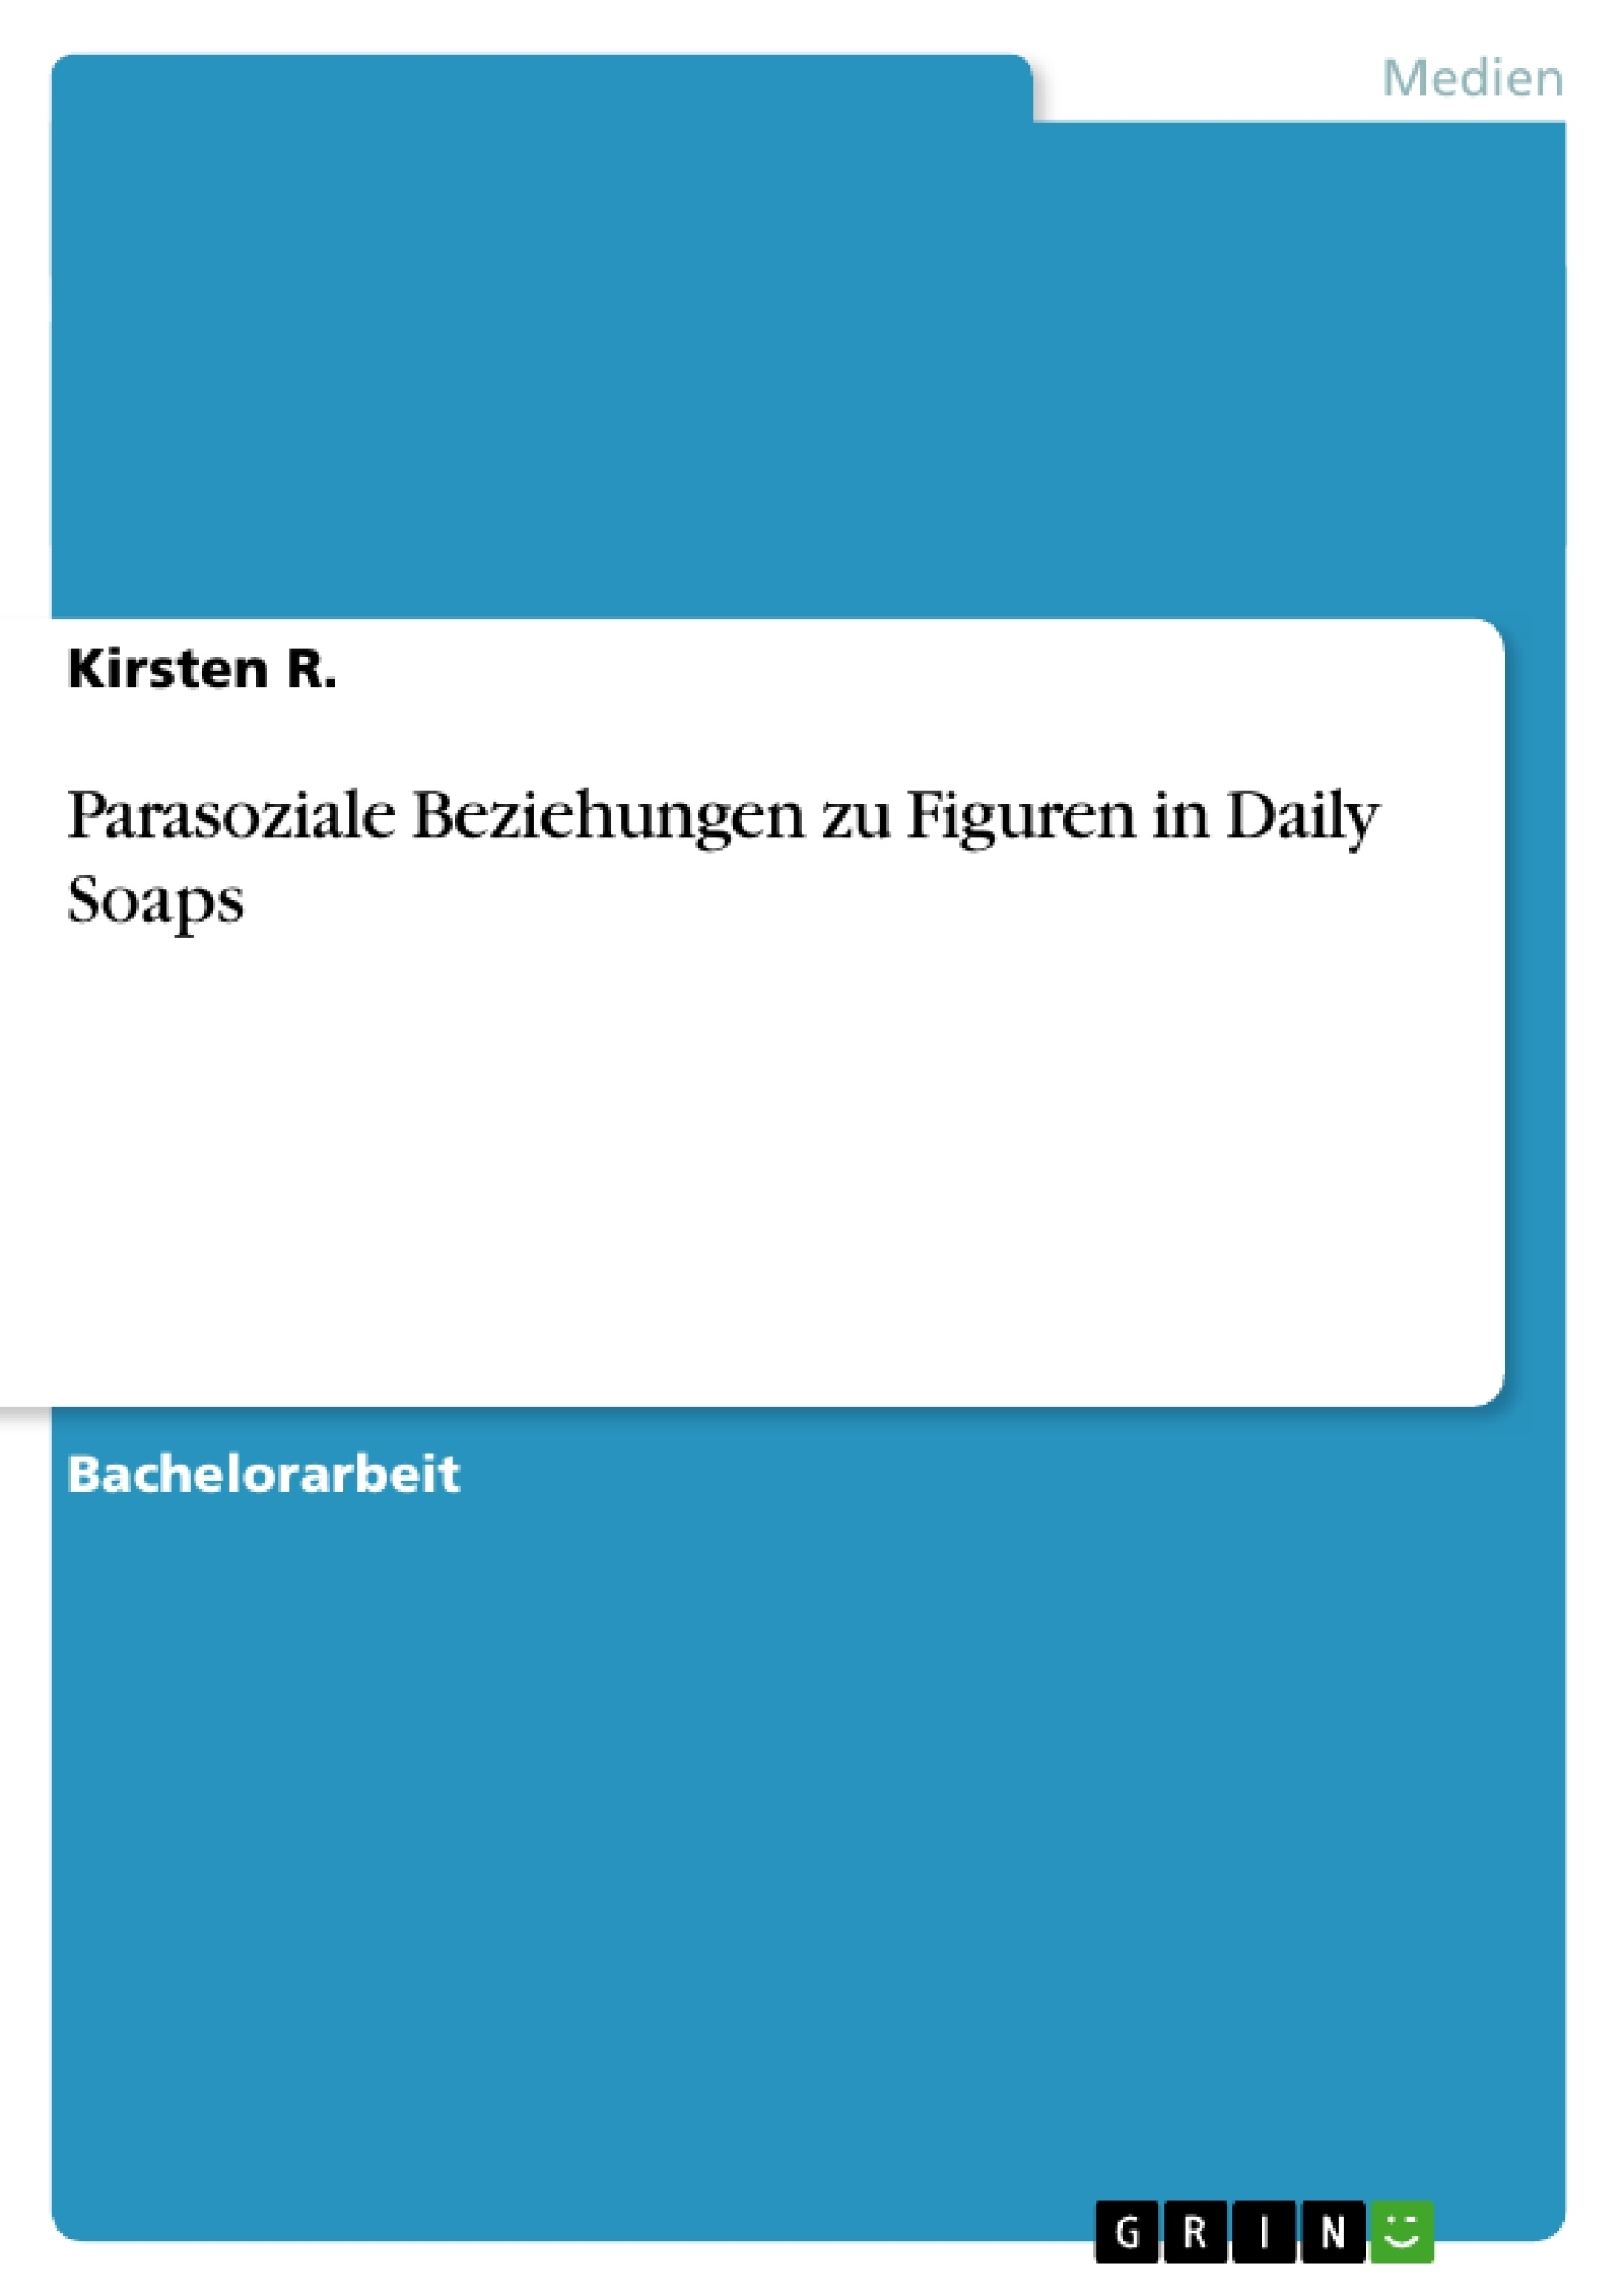 Titel: Parasoziale Beziehungen zu Figuren in Daily Soaps